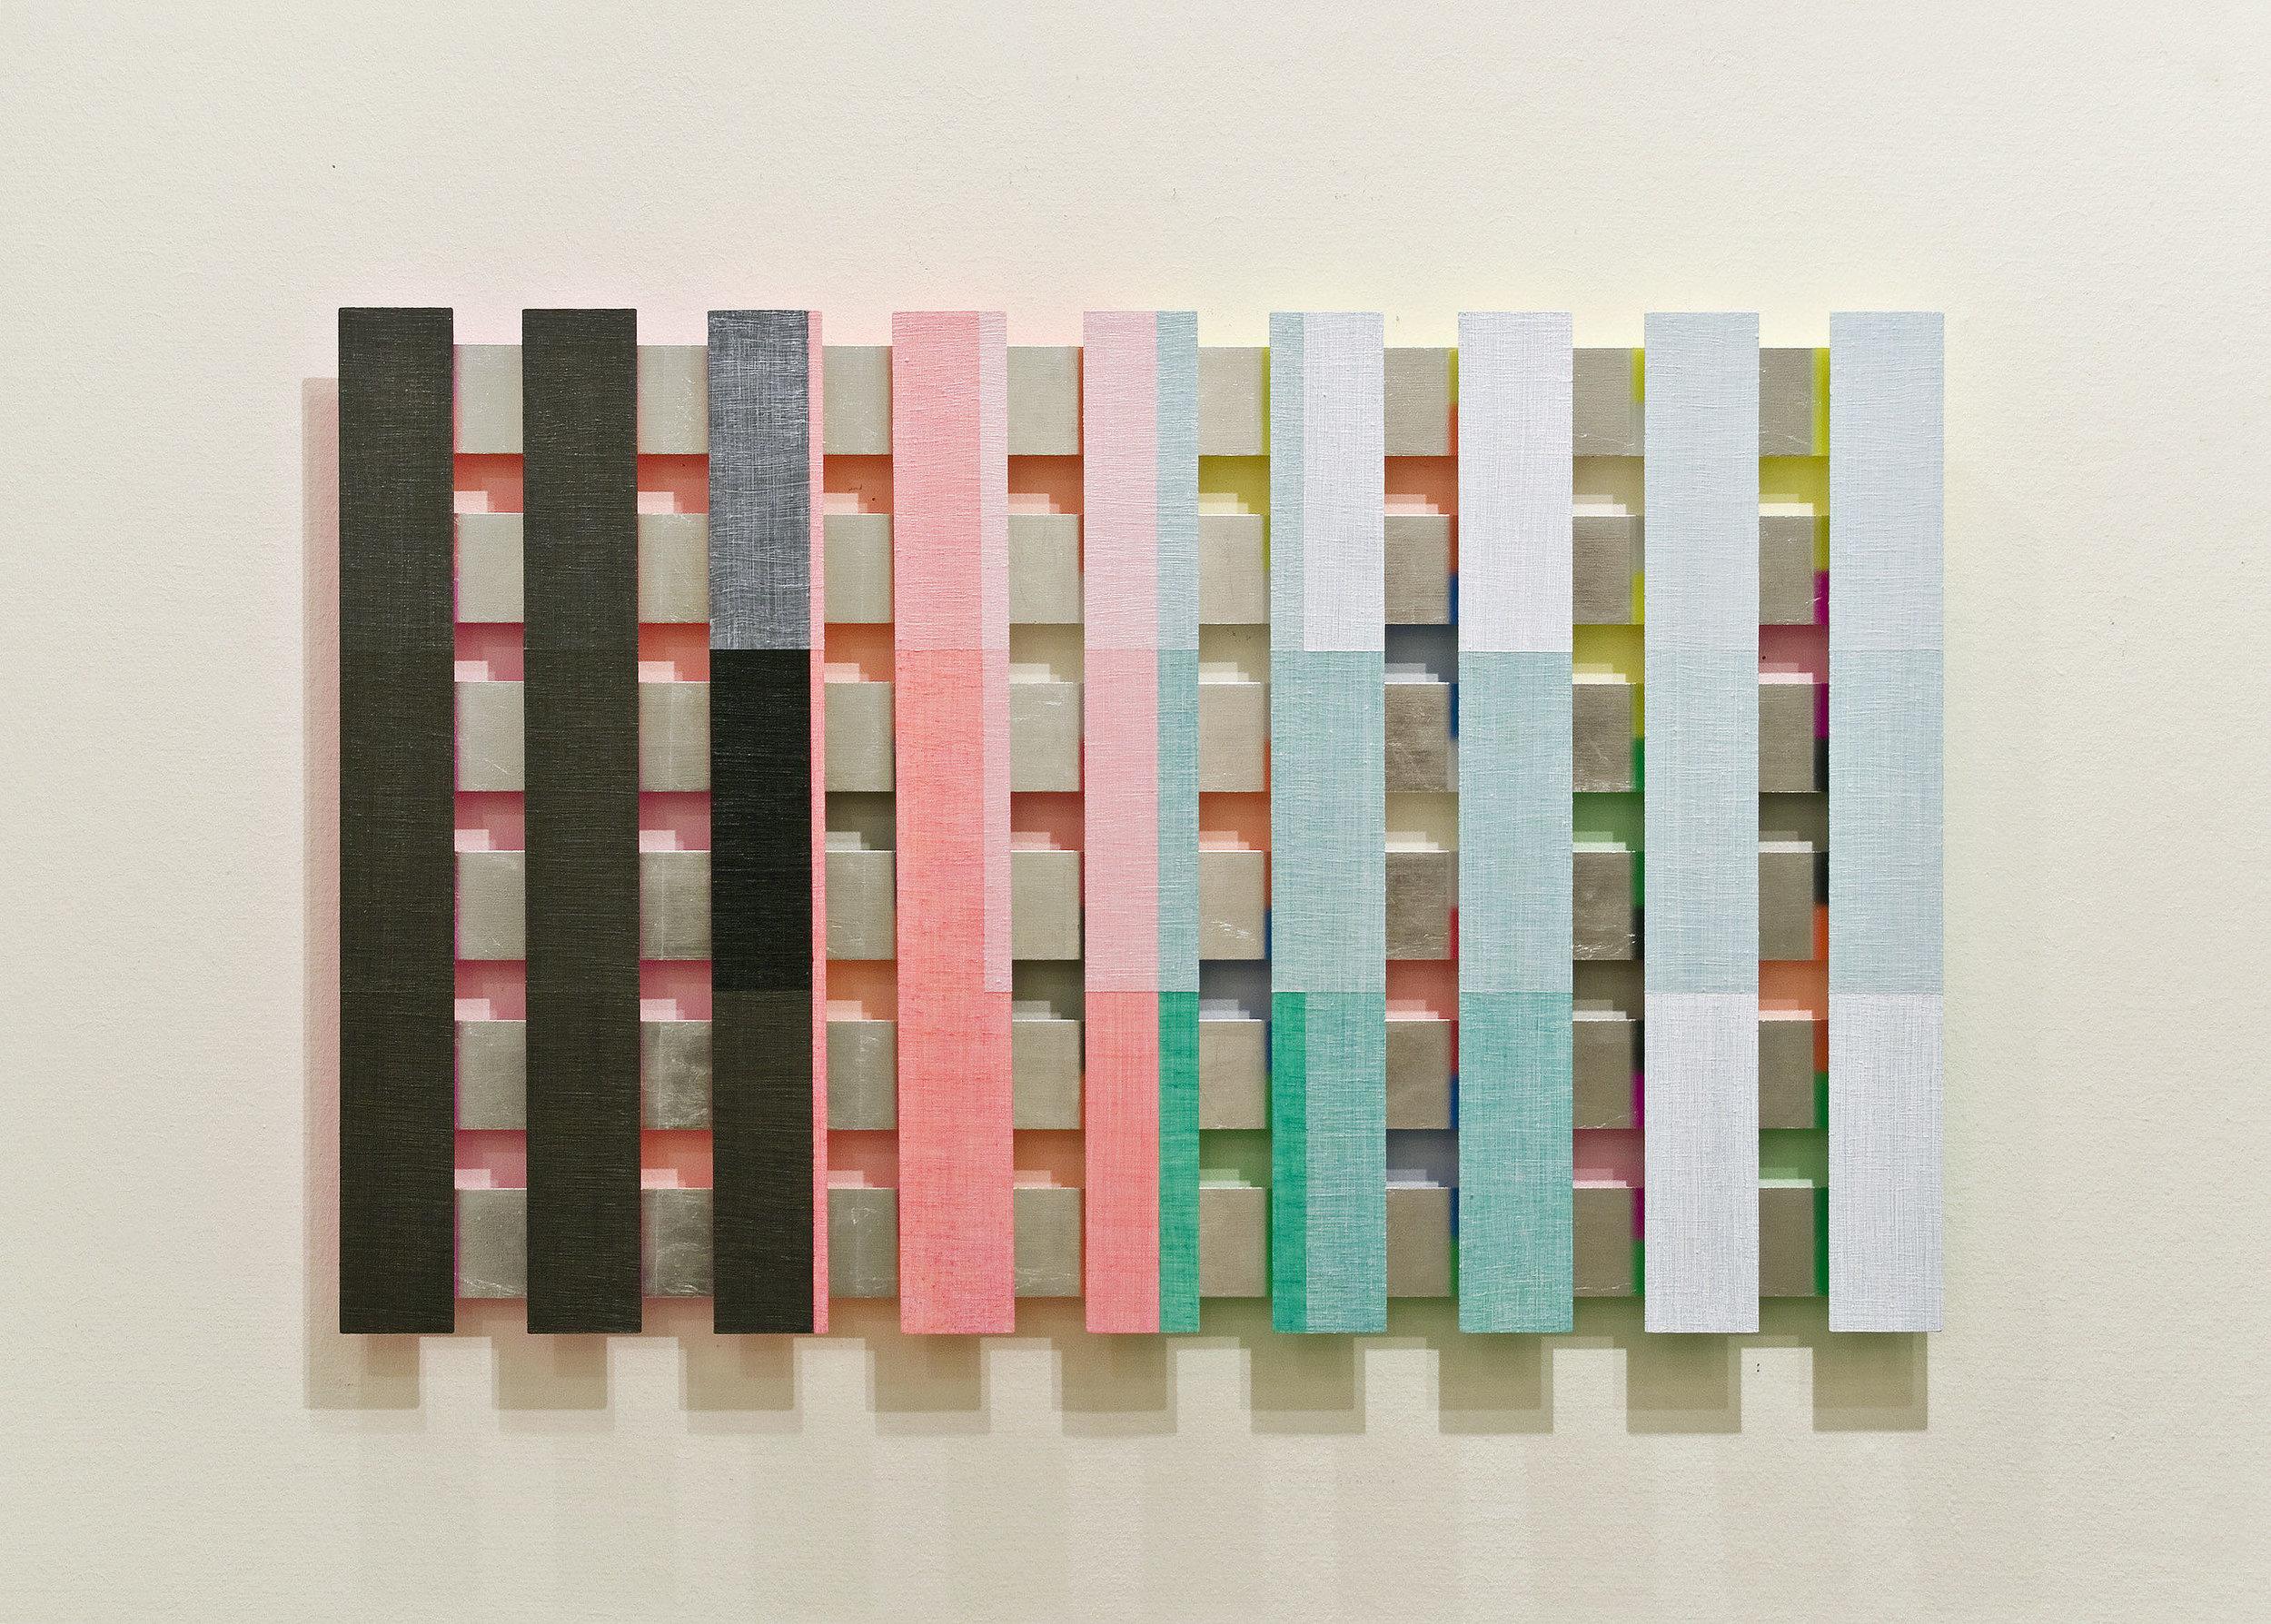 2n akril, les, 79 x 125 cm, 2009.jpg